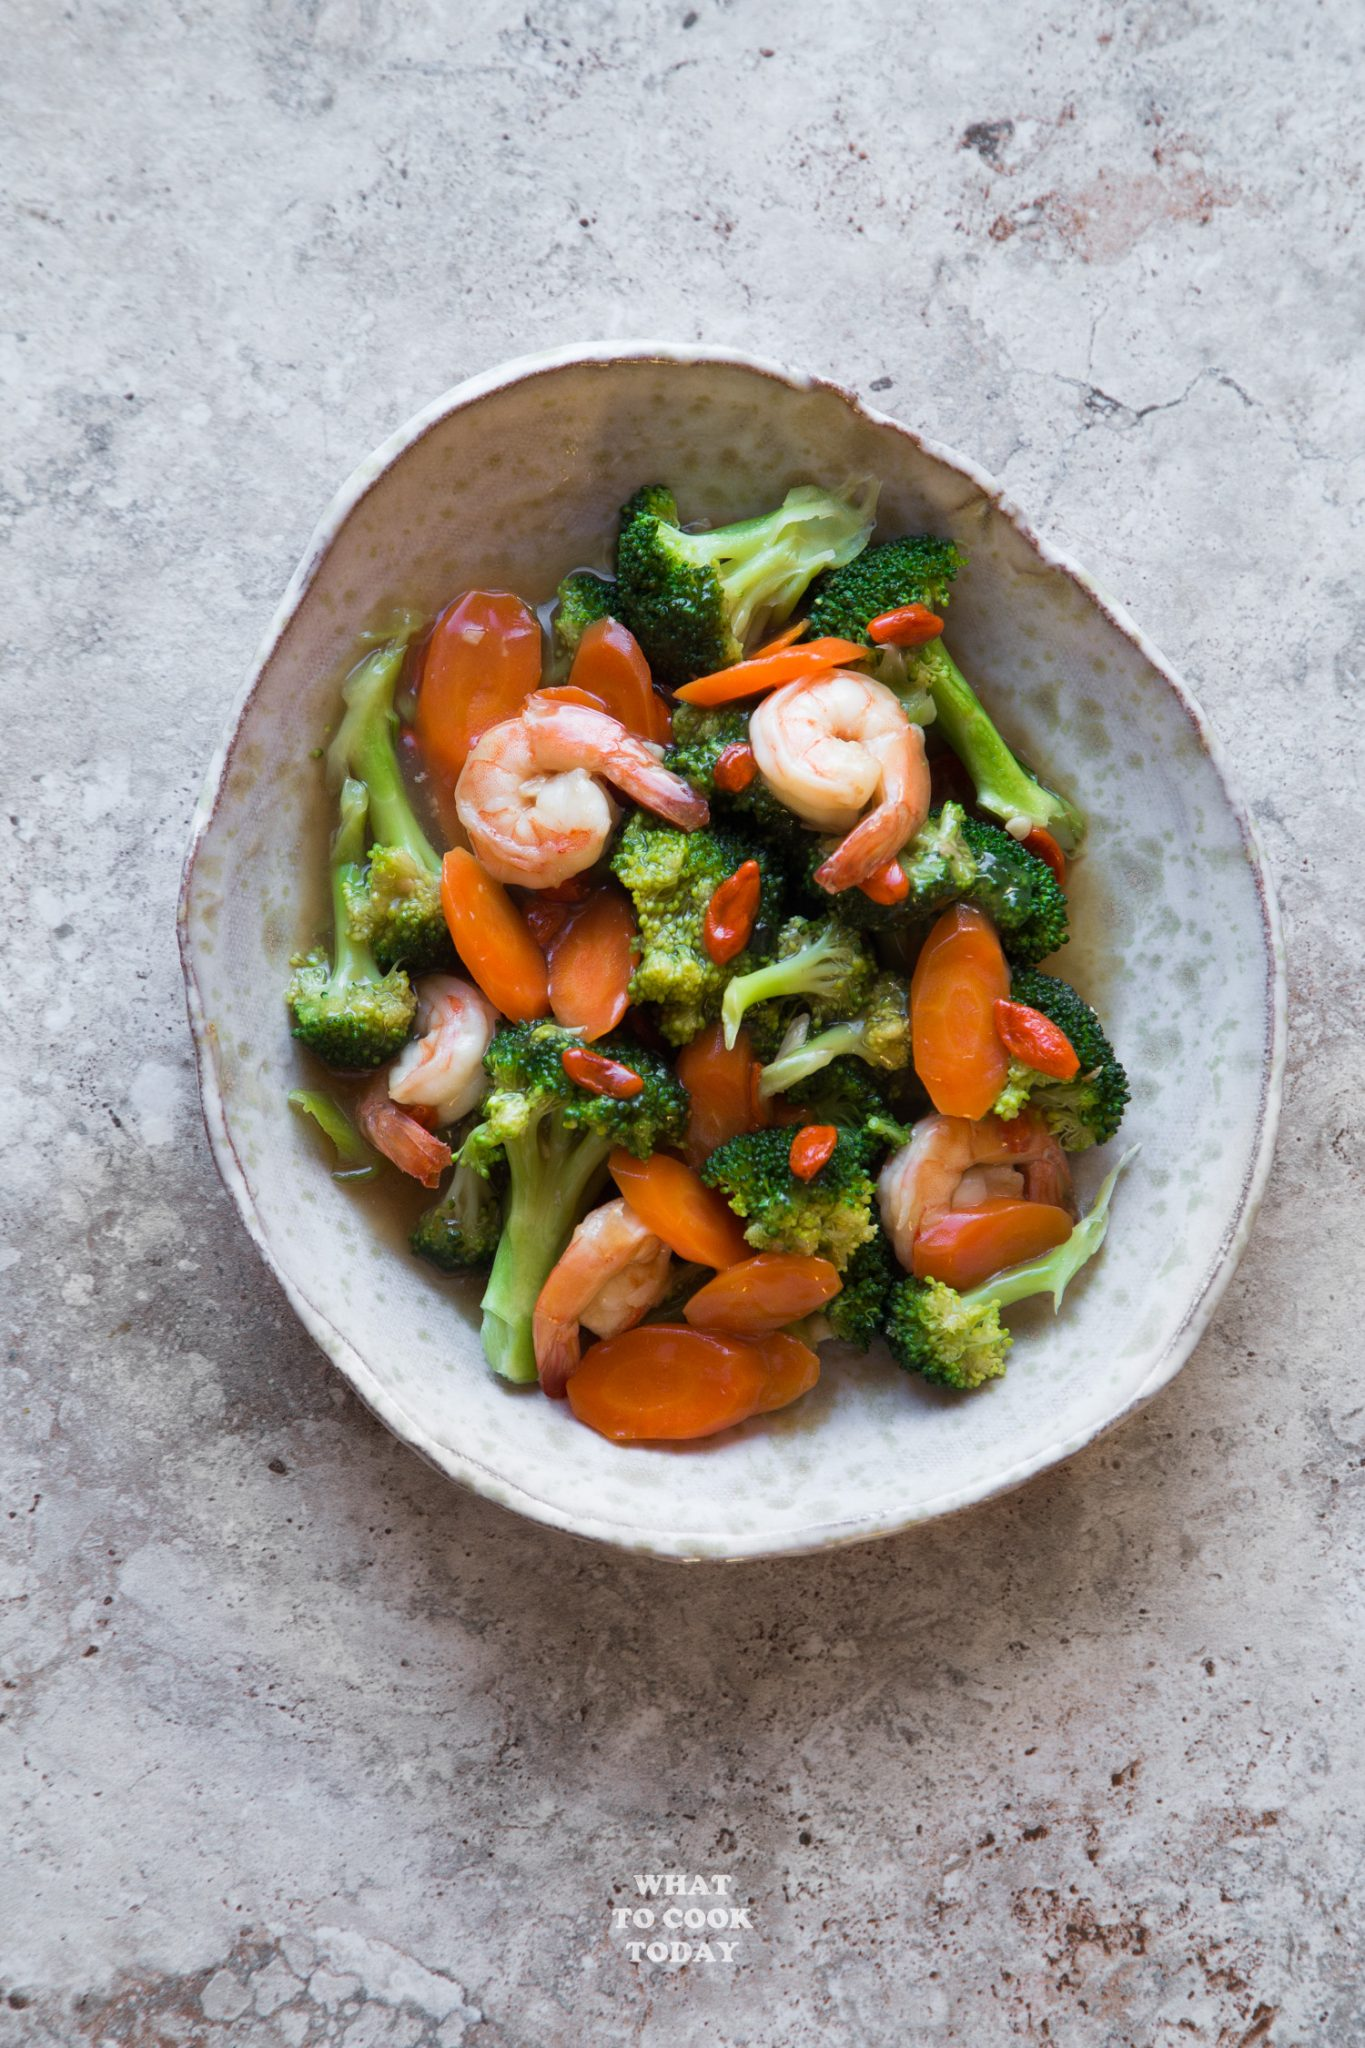 Broccoli Shrimp Goji Berry Stir-fry #ad #LingLingAsianFood #LL #asianfood #chopsticks #easymeals #potstickers #friedrice